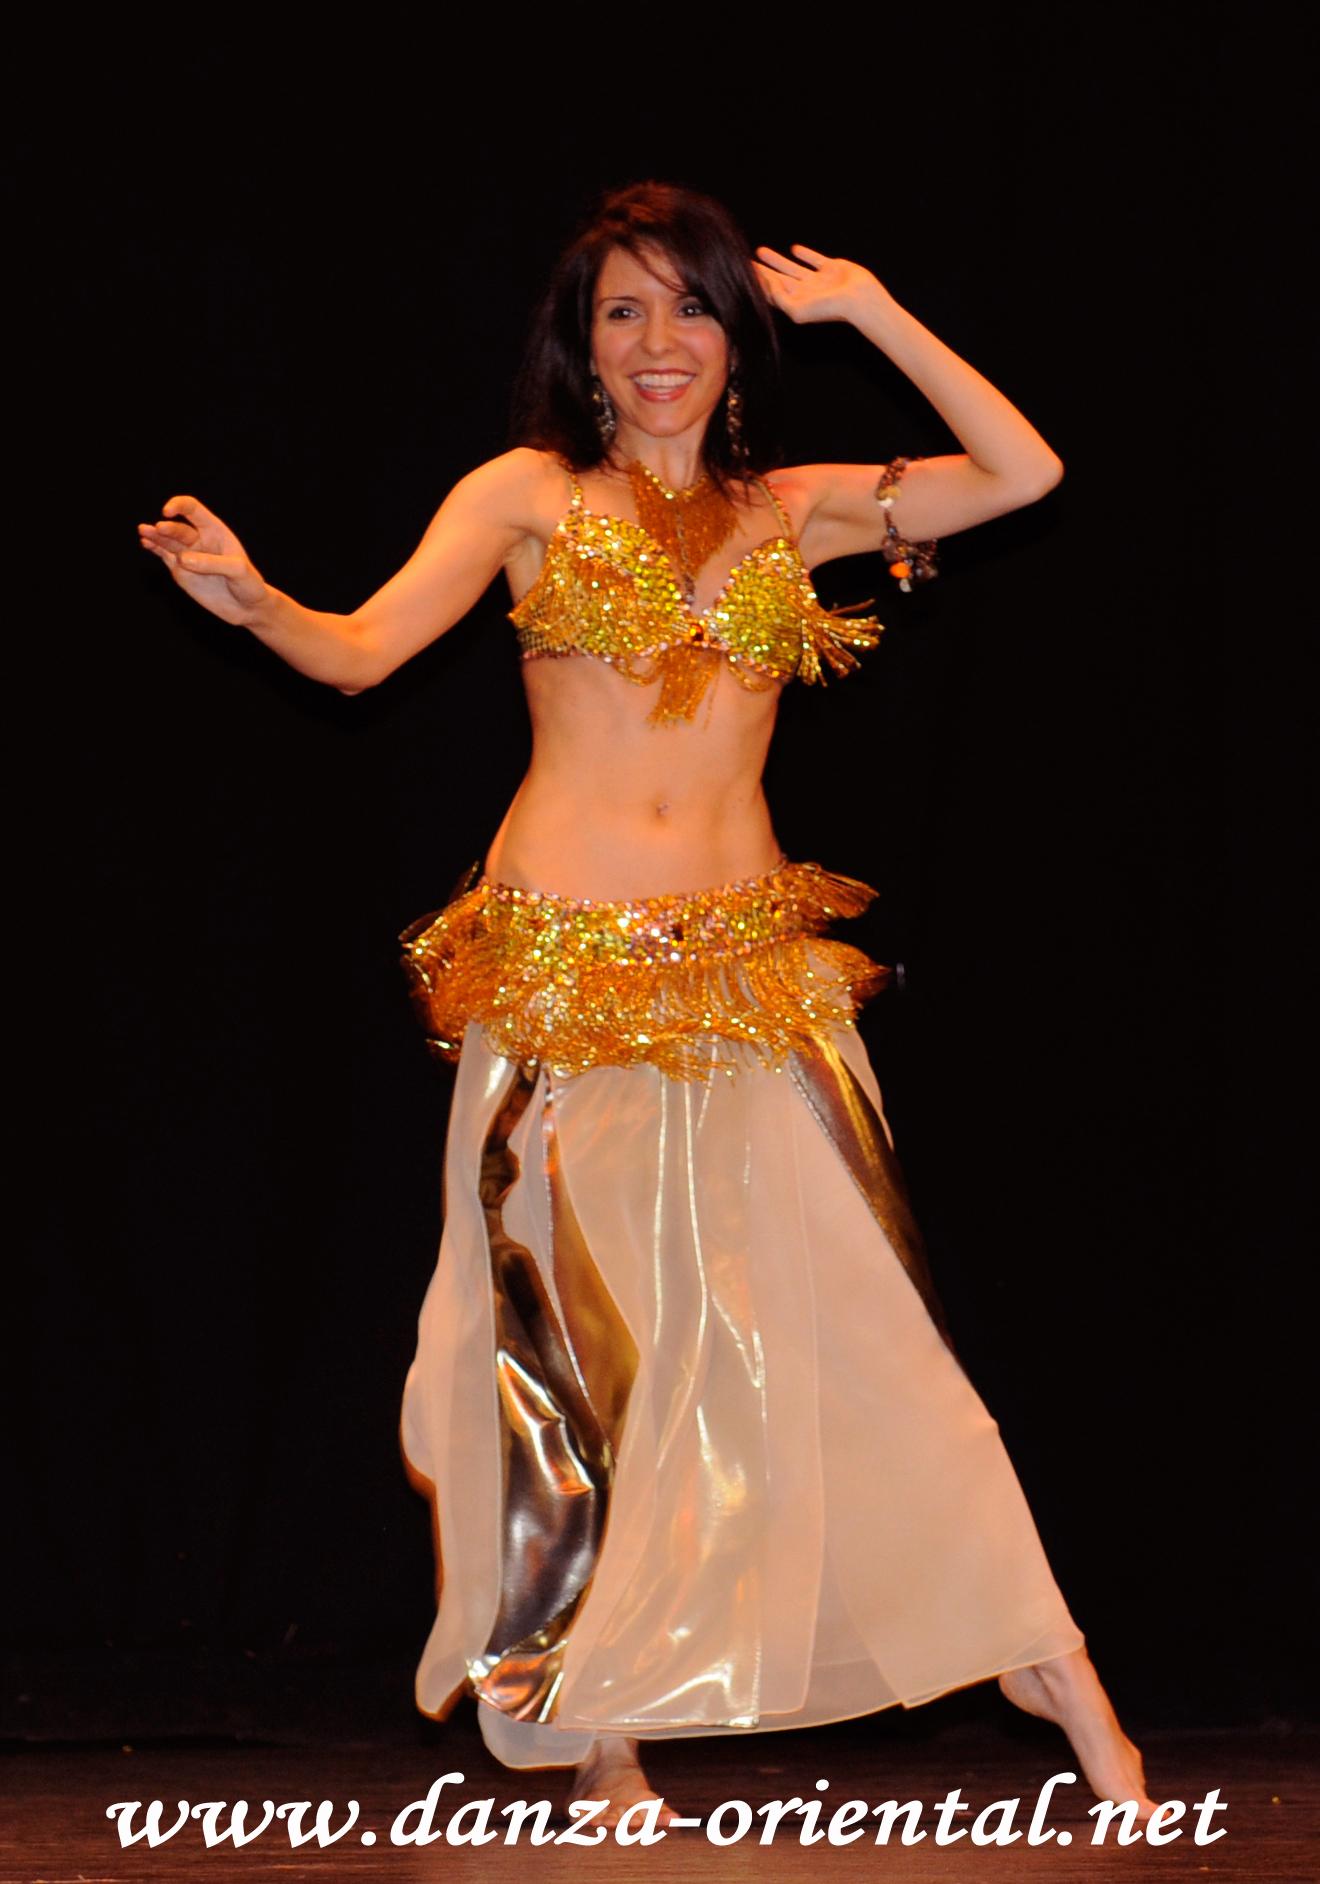 danza-oriental-dorado